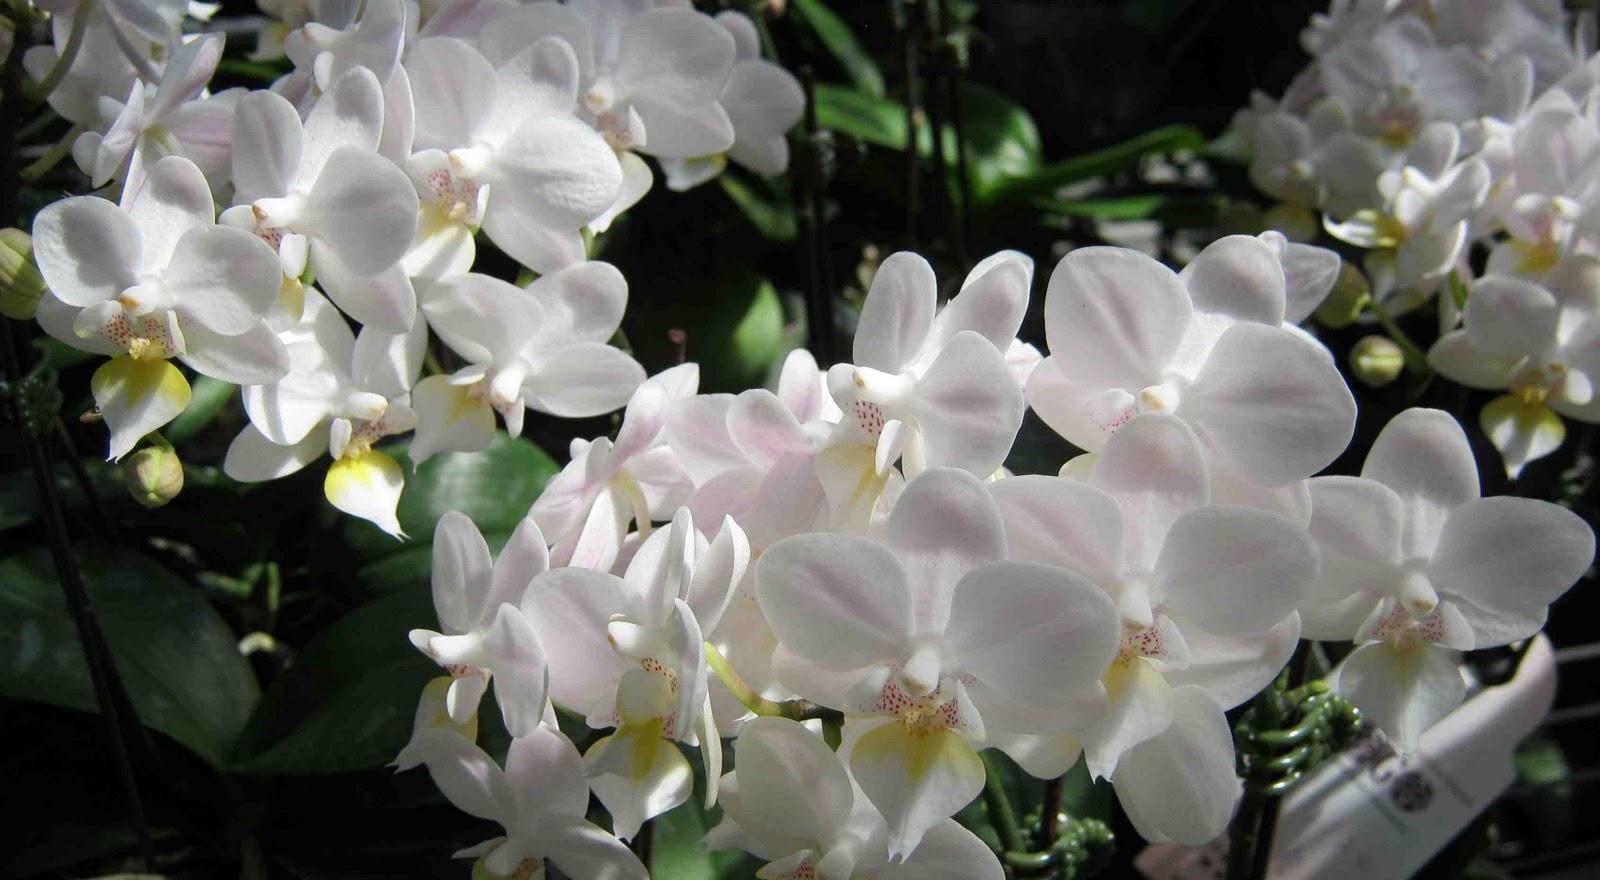 Philippine Gardener Taiwans Gems Phalaenopsis Orchids Part 1